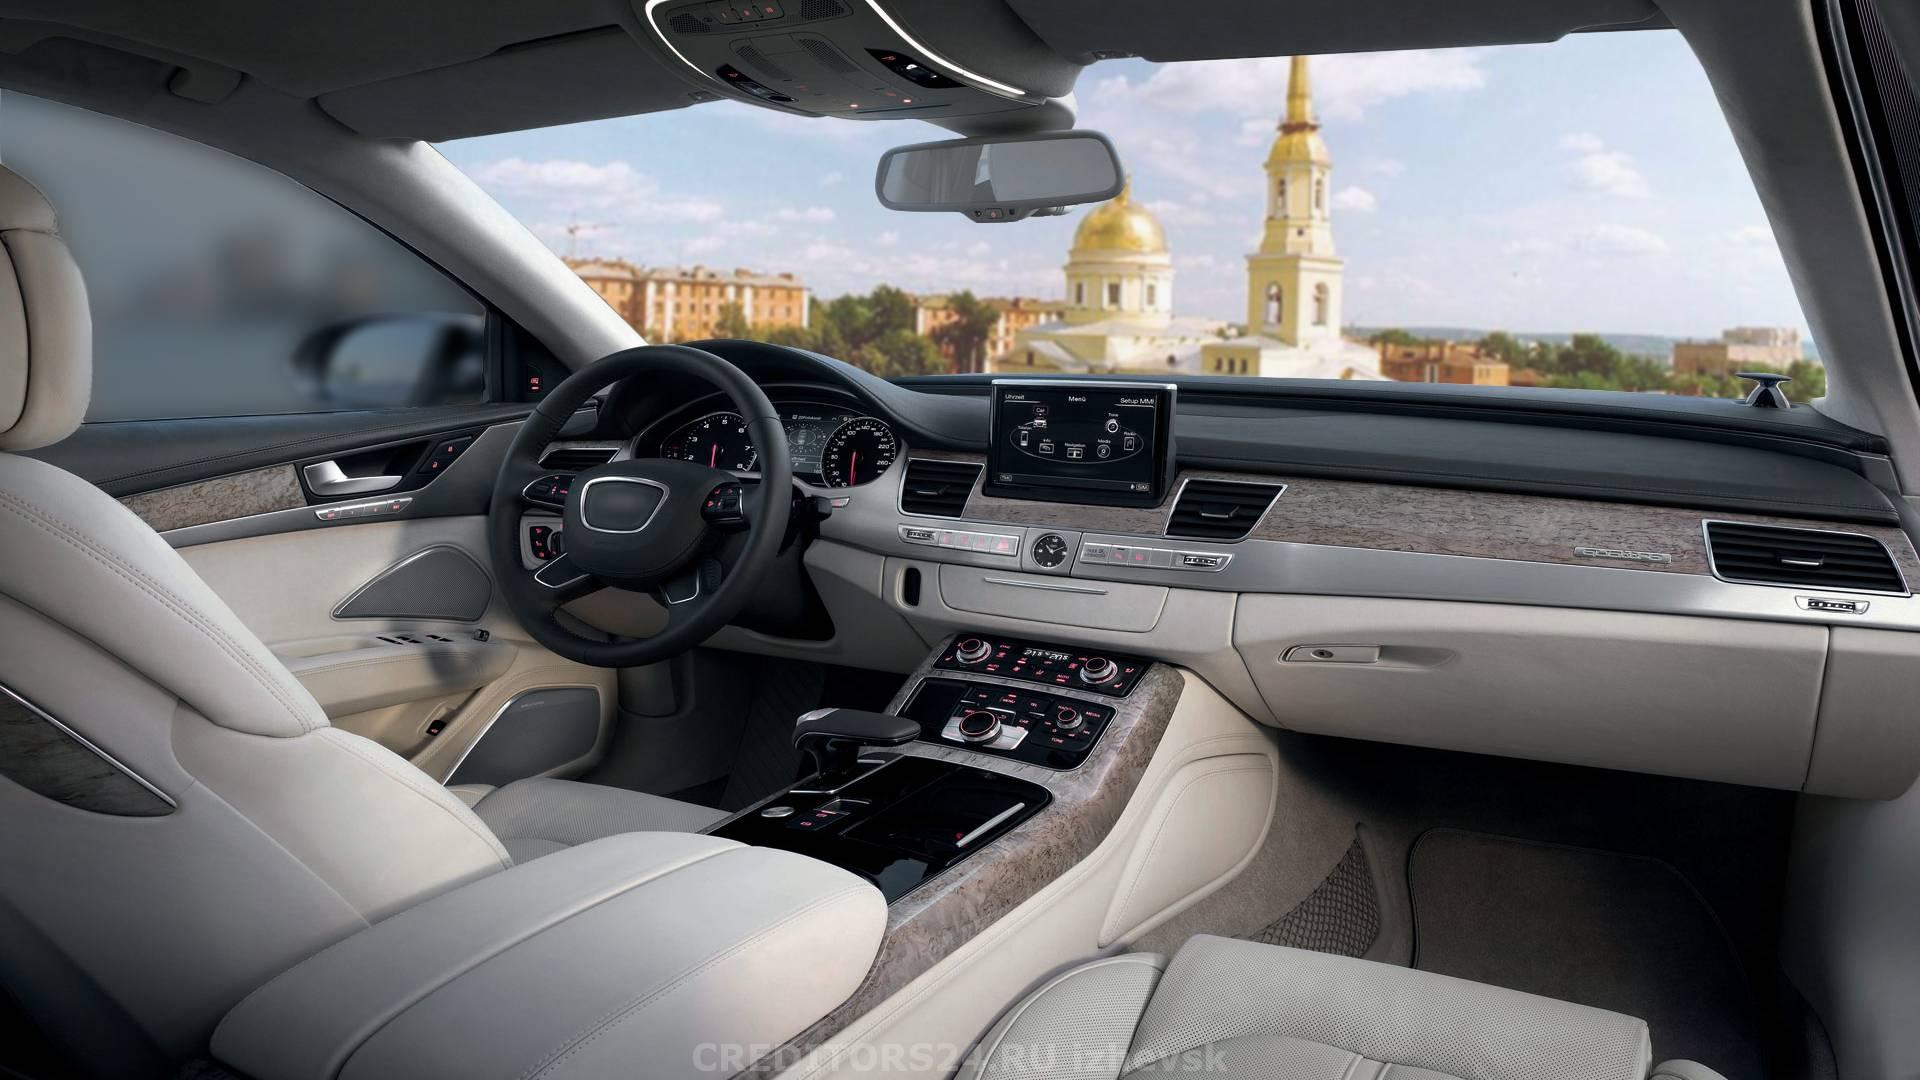 Кредит под залог птс ижевск автомойщик в автосалон вакансии москва